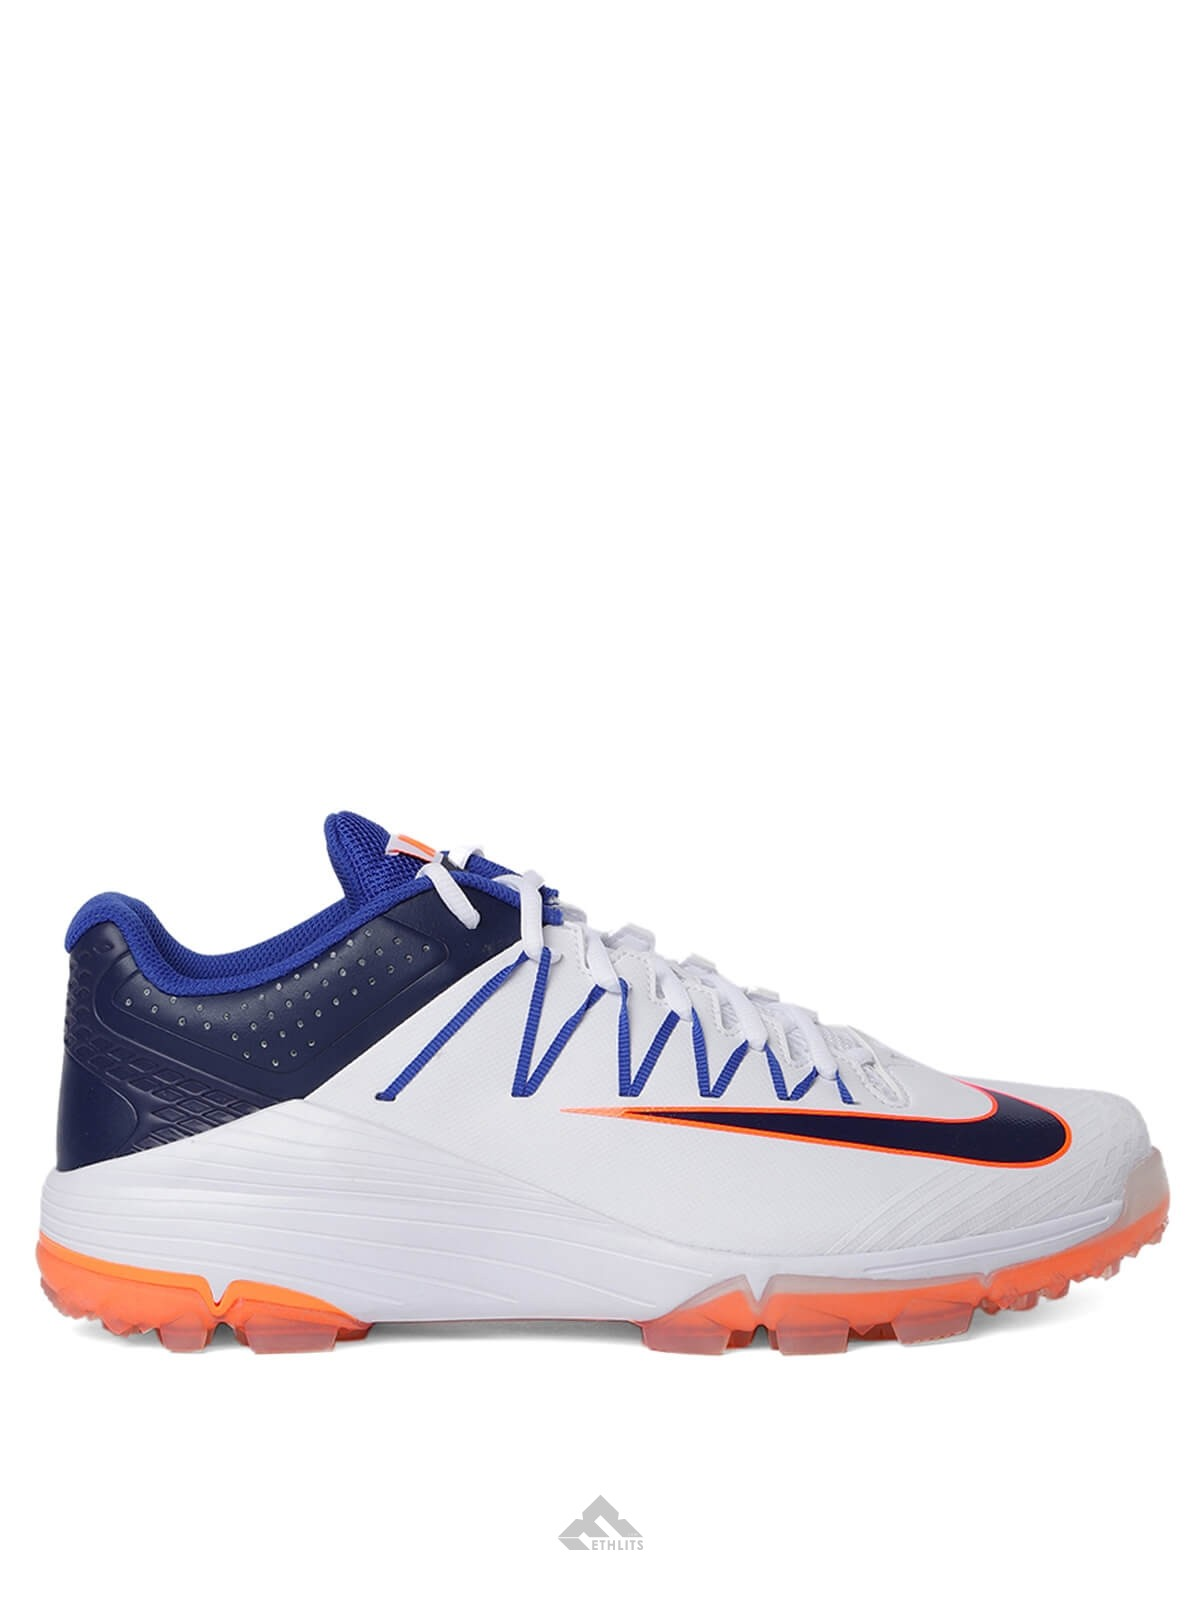 Buy Nike Domain 2 NS White/Binary Blue